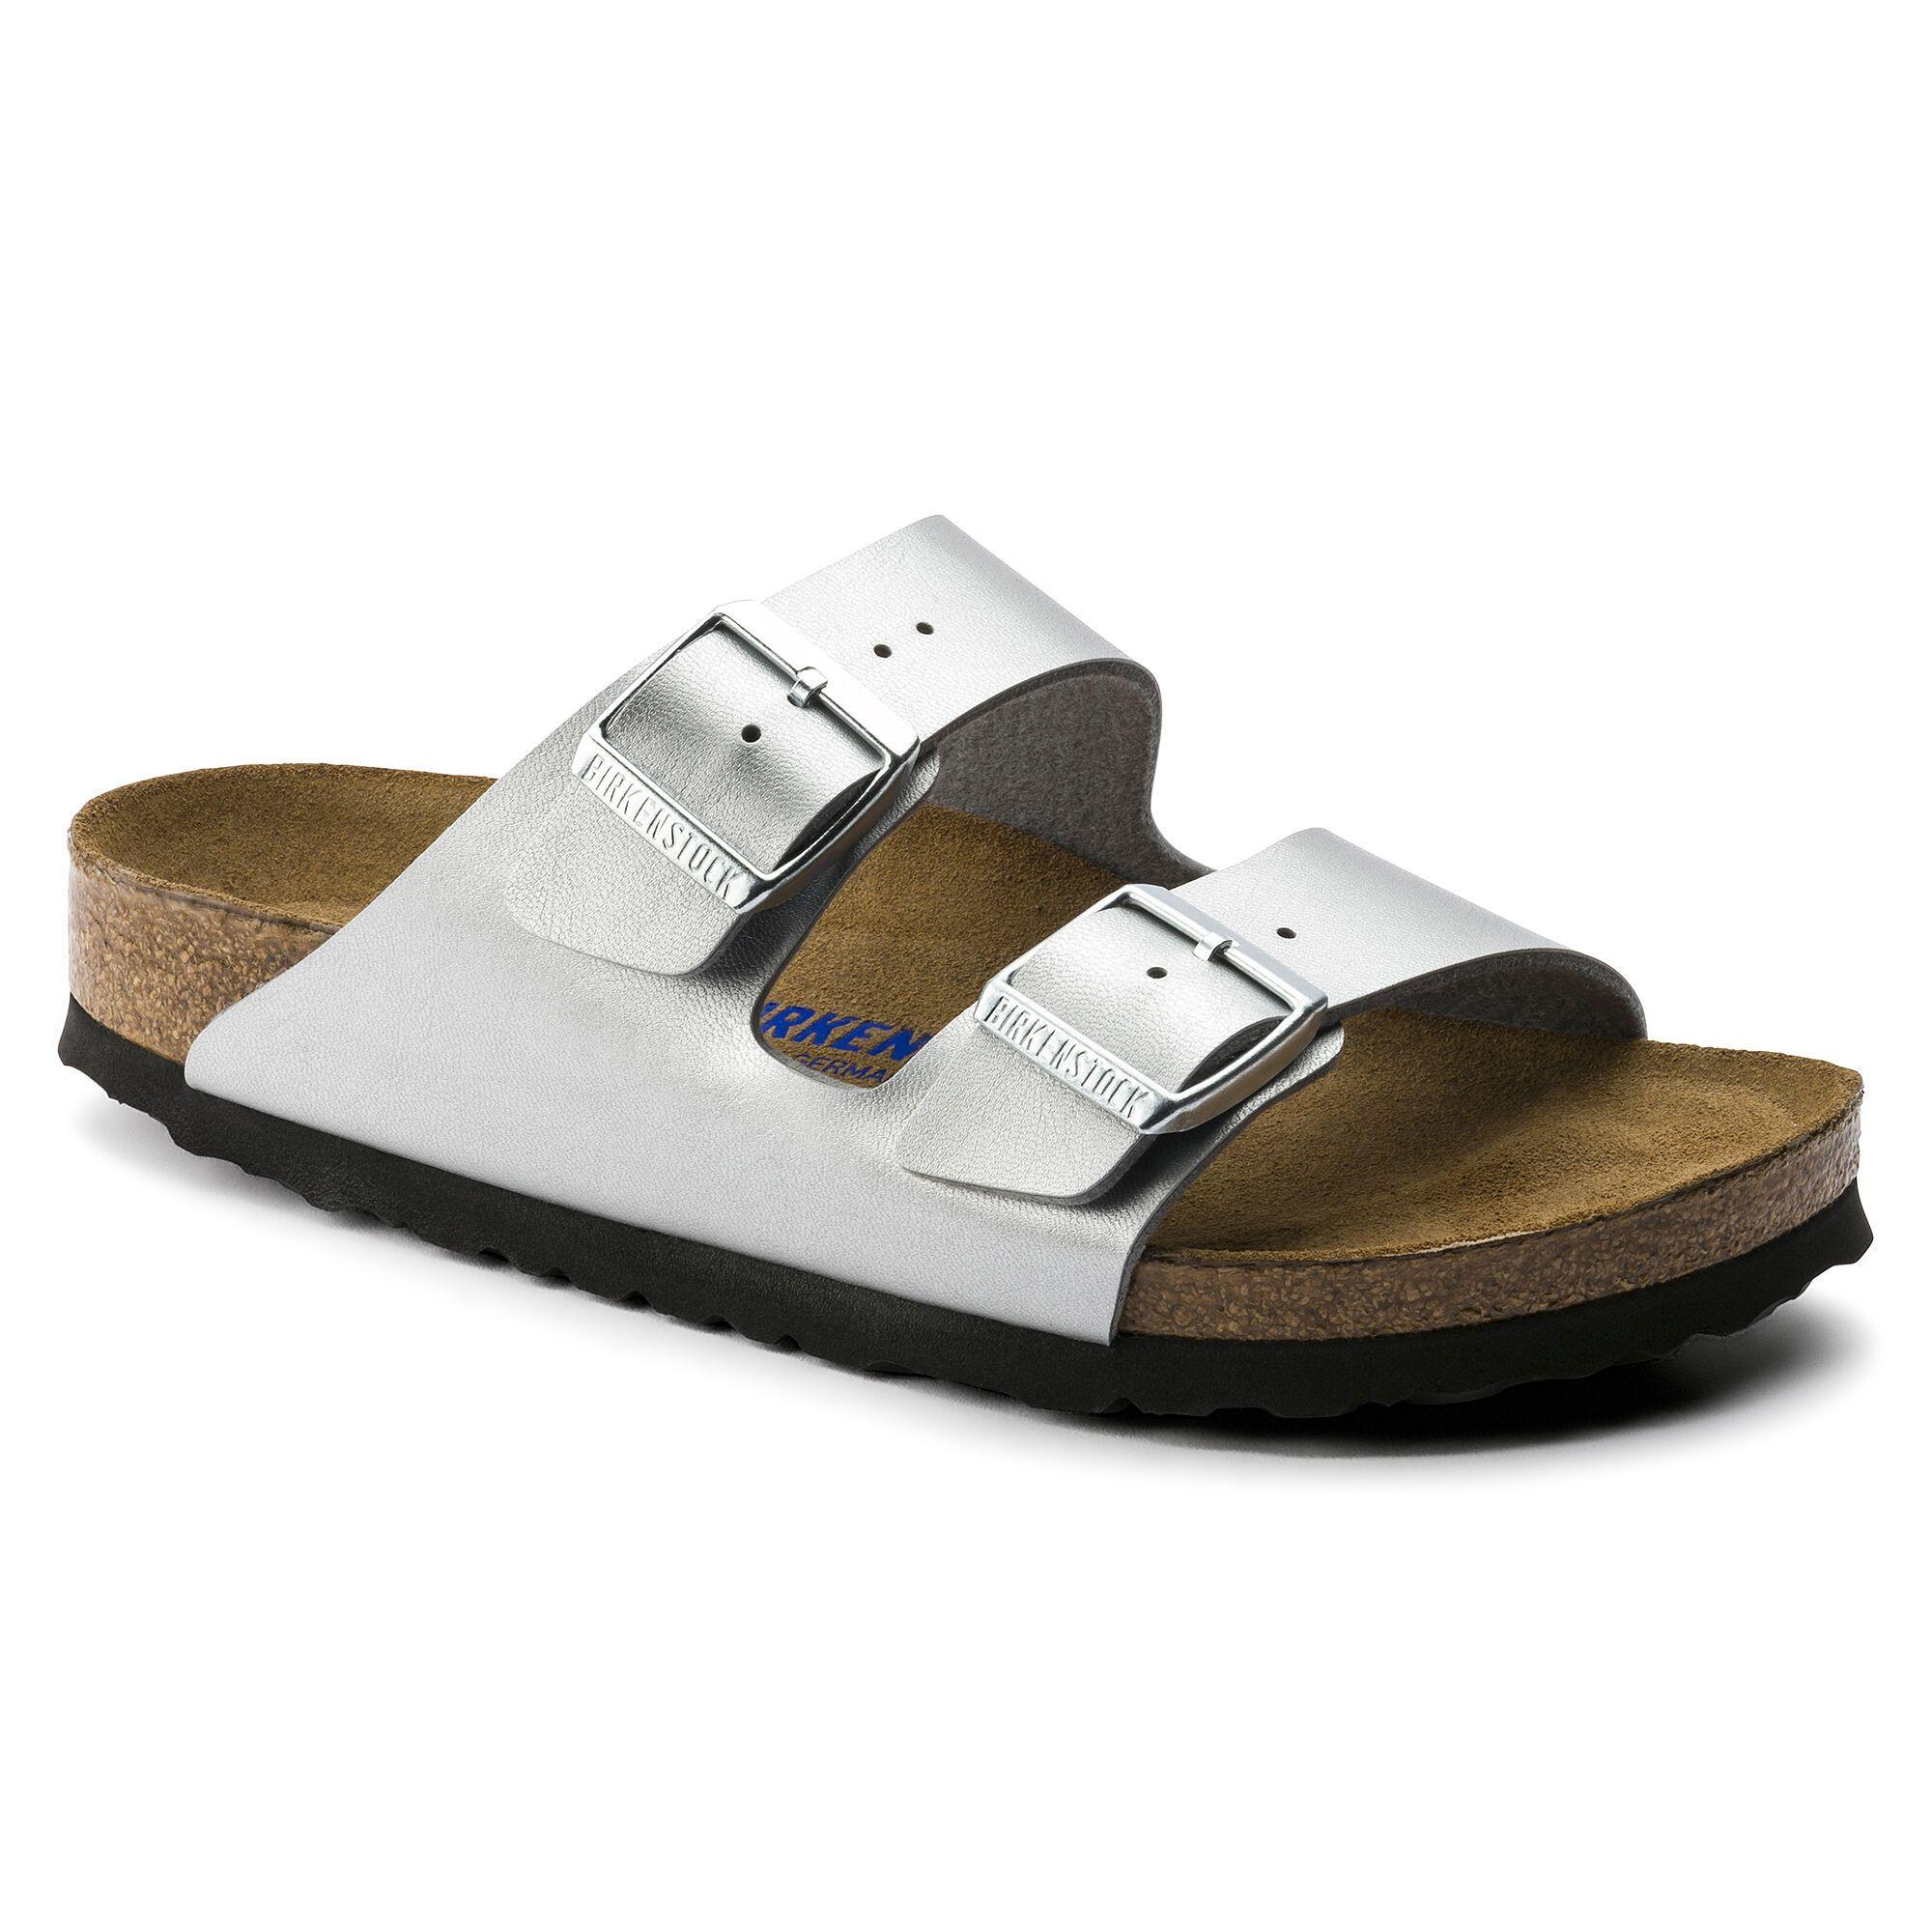 Papillio Arizona Platform Leather Casual Open-Back Slide Womens Sandals